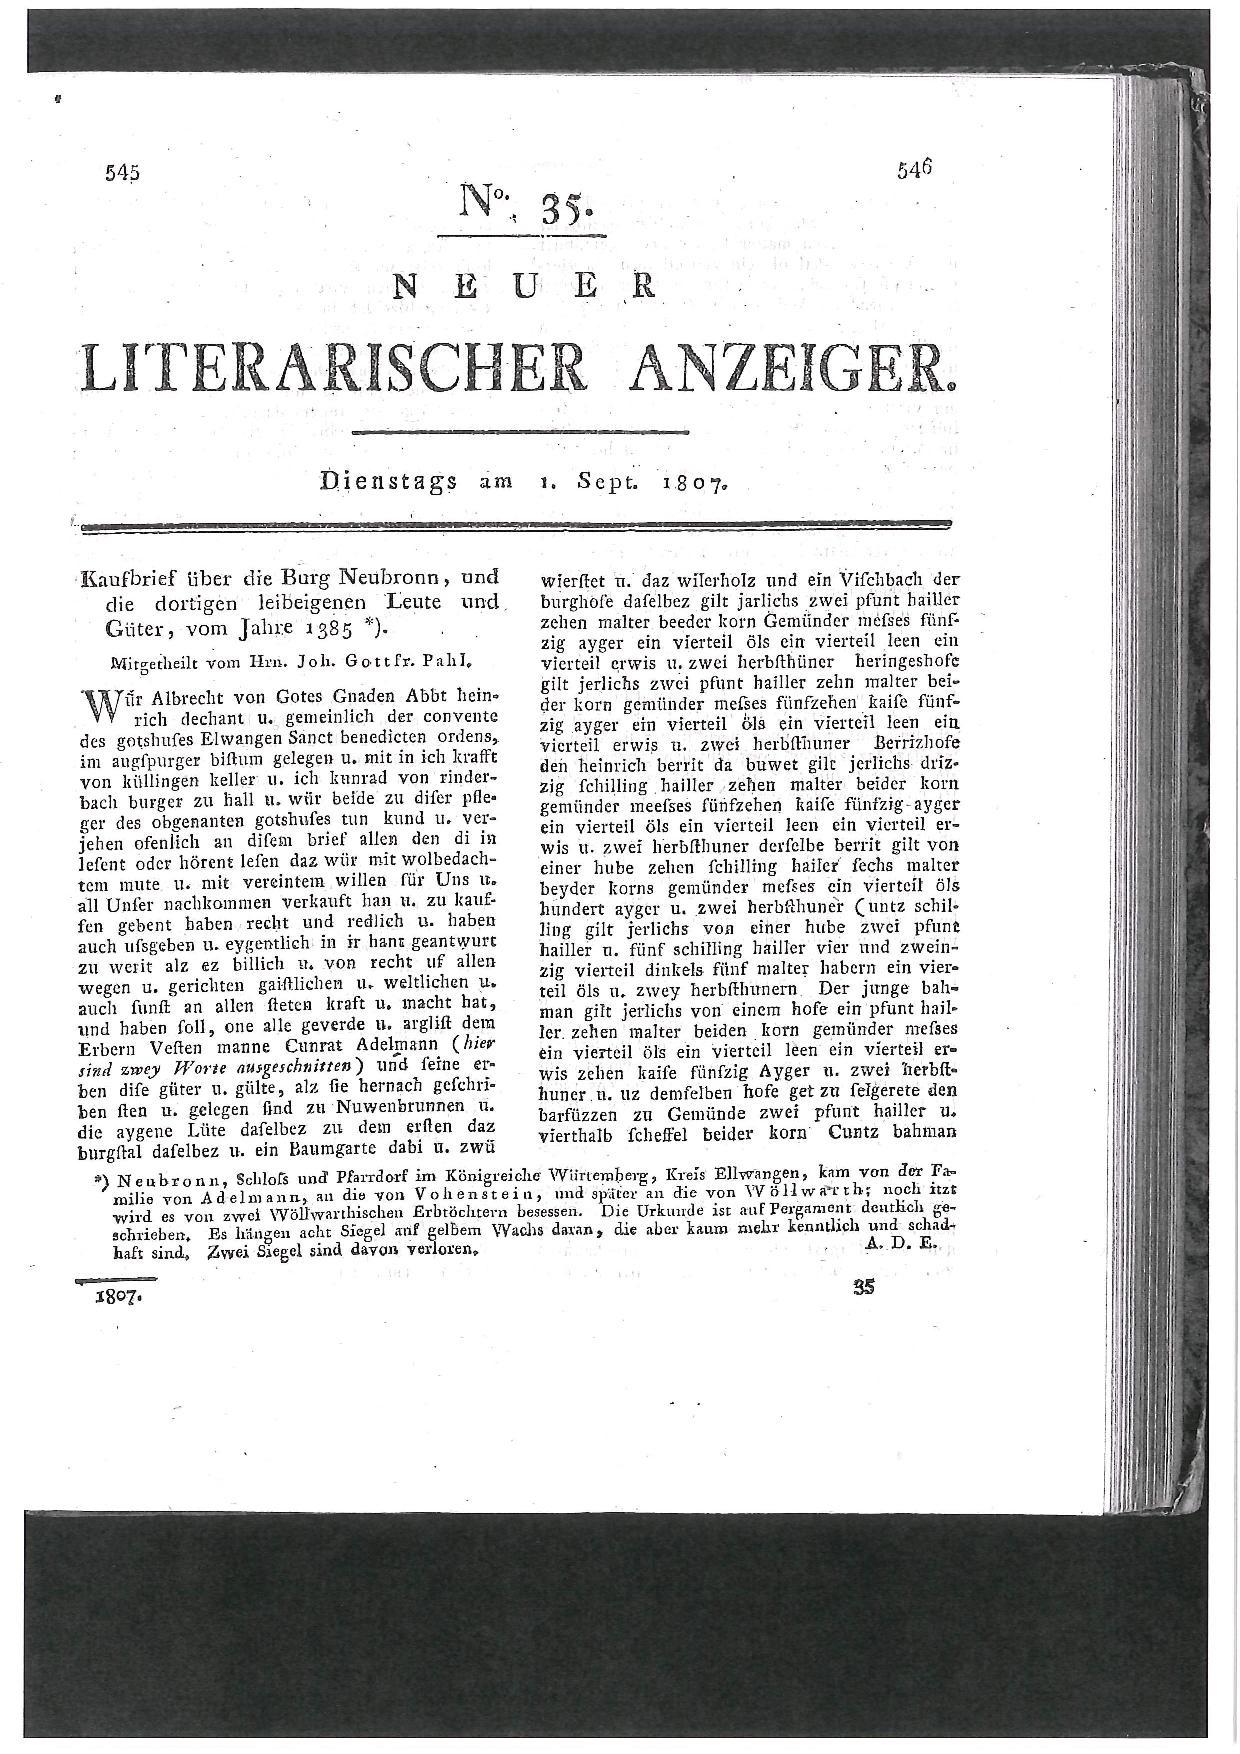 File:Pahl neubronn.pdf - Wikimedia Commons